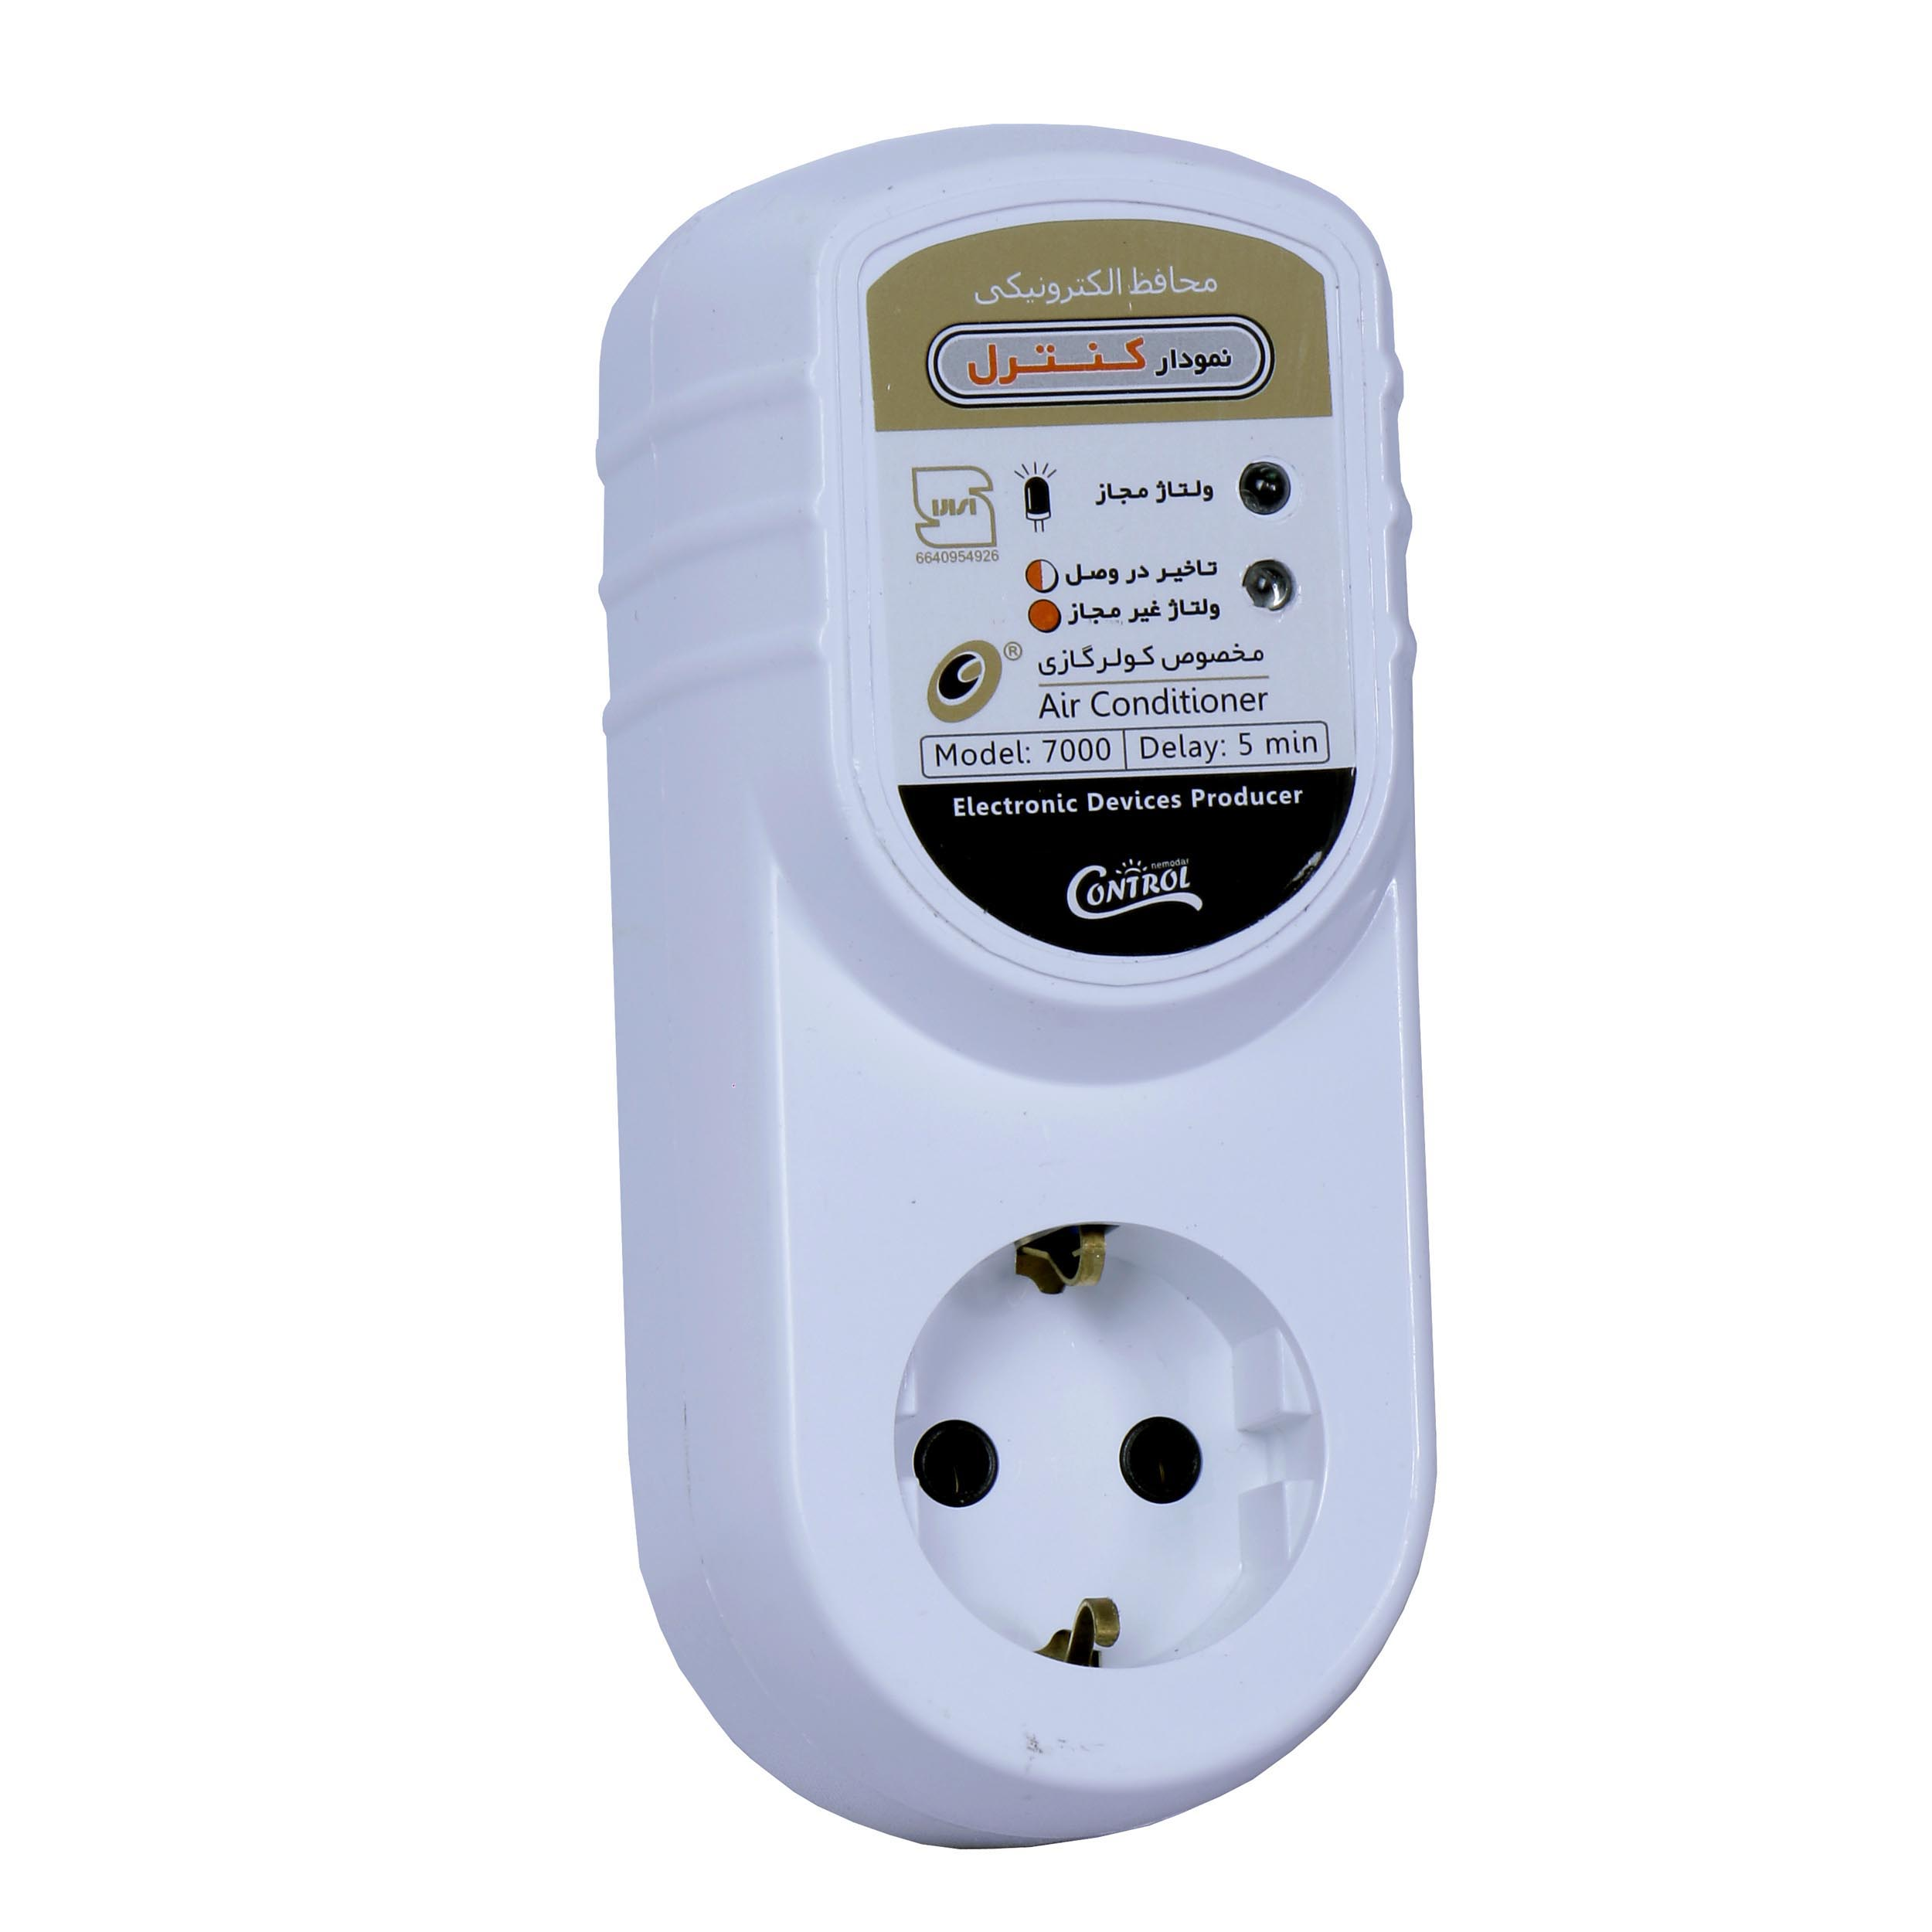 محافظ ولتاژ نمودار کنترل کد 12409